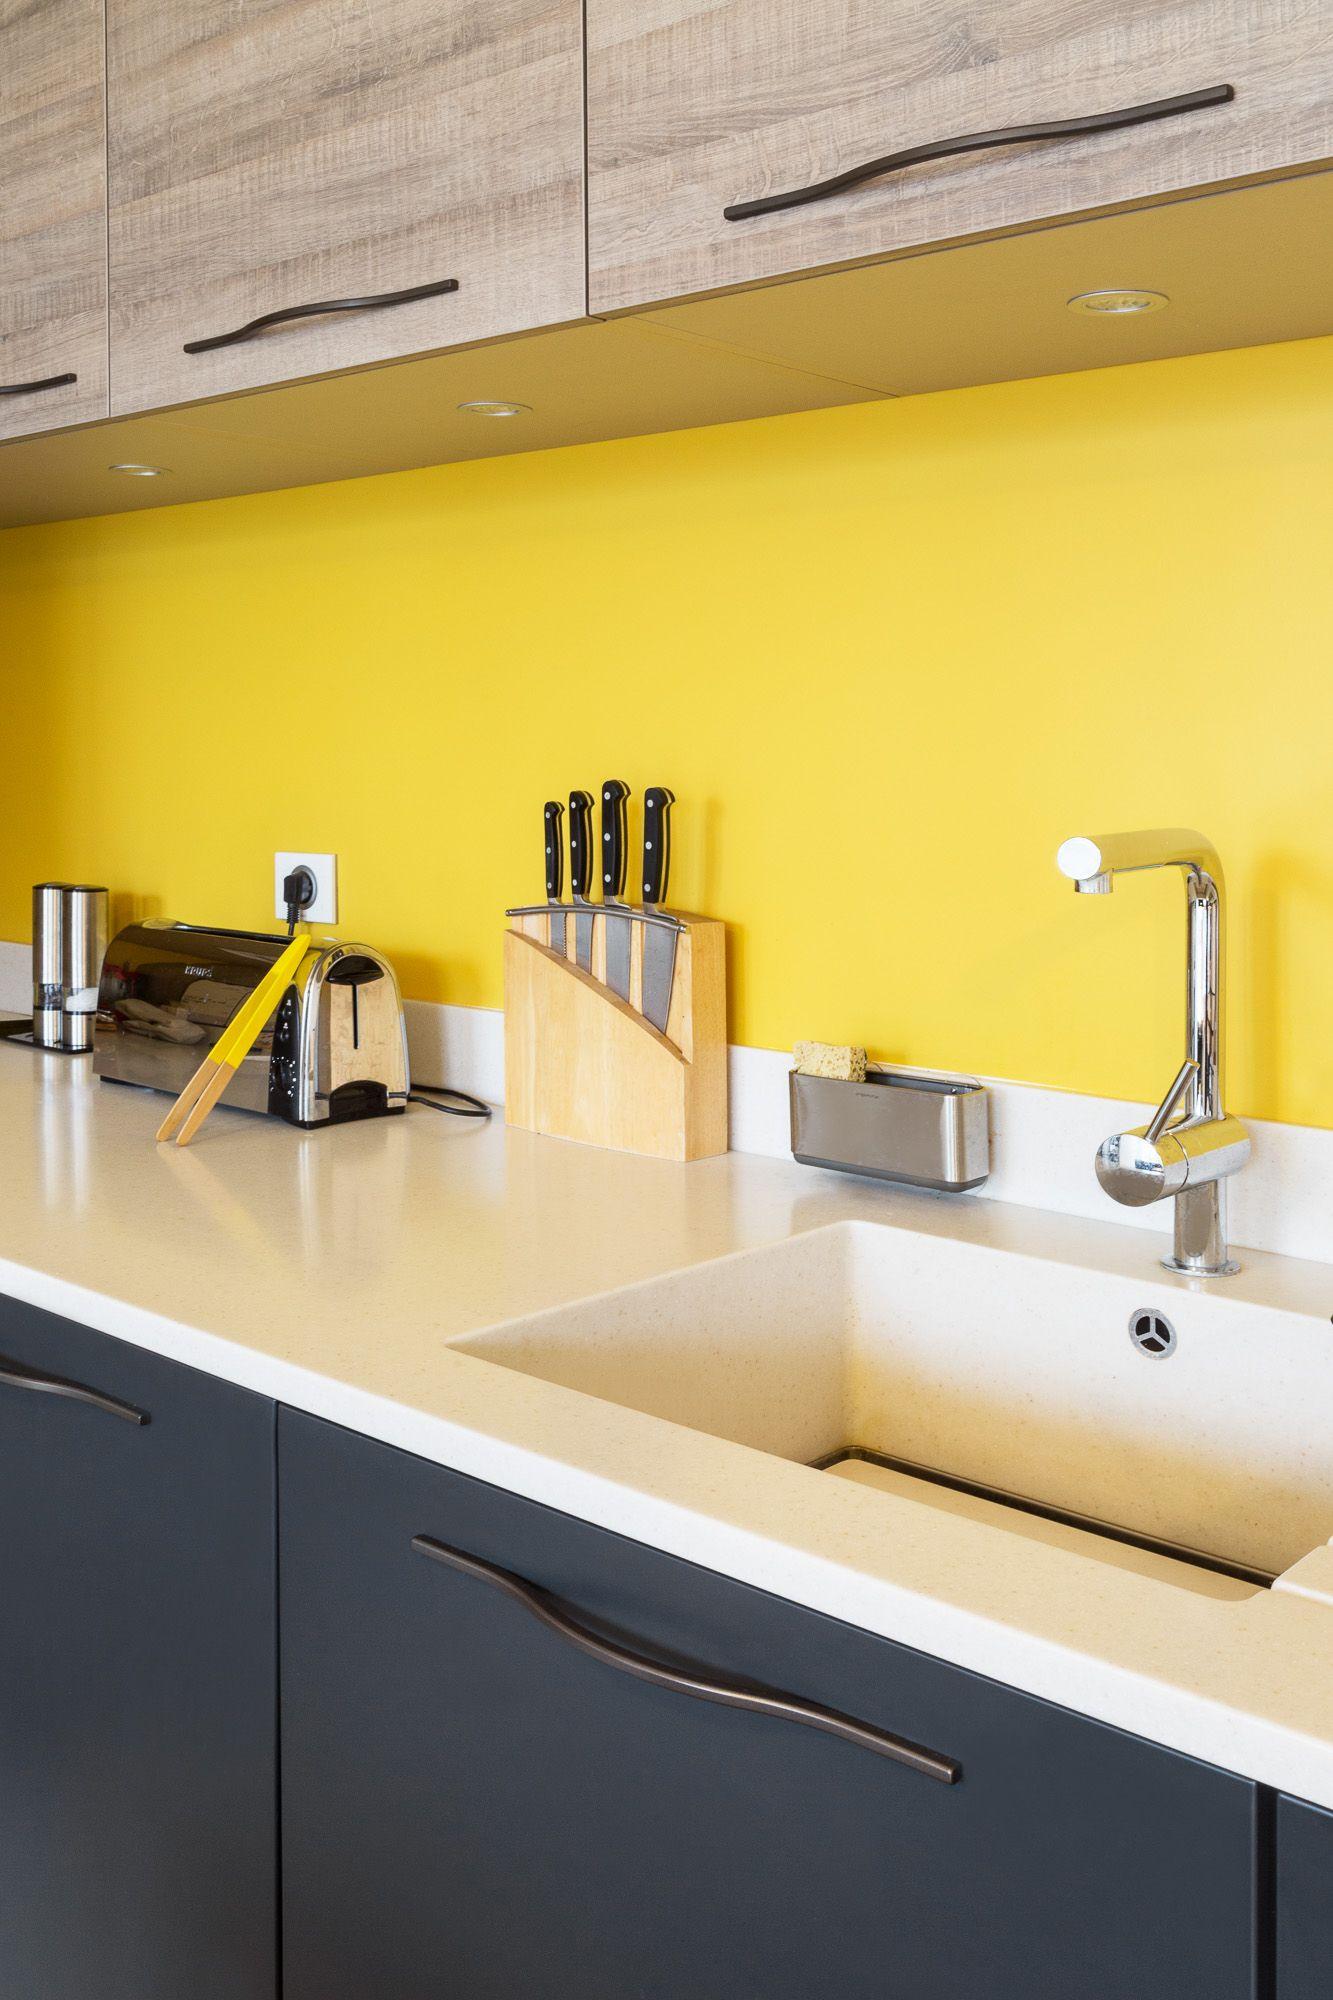 Mur jaune vif comme contraste dans la cuisine for Cuisine mur jaune